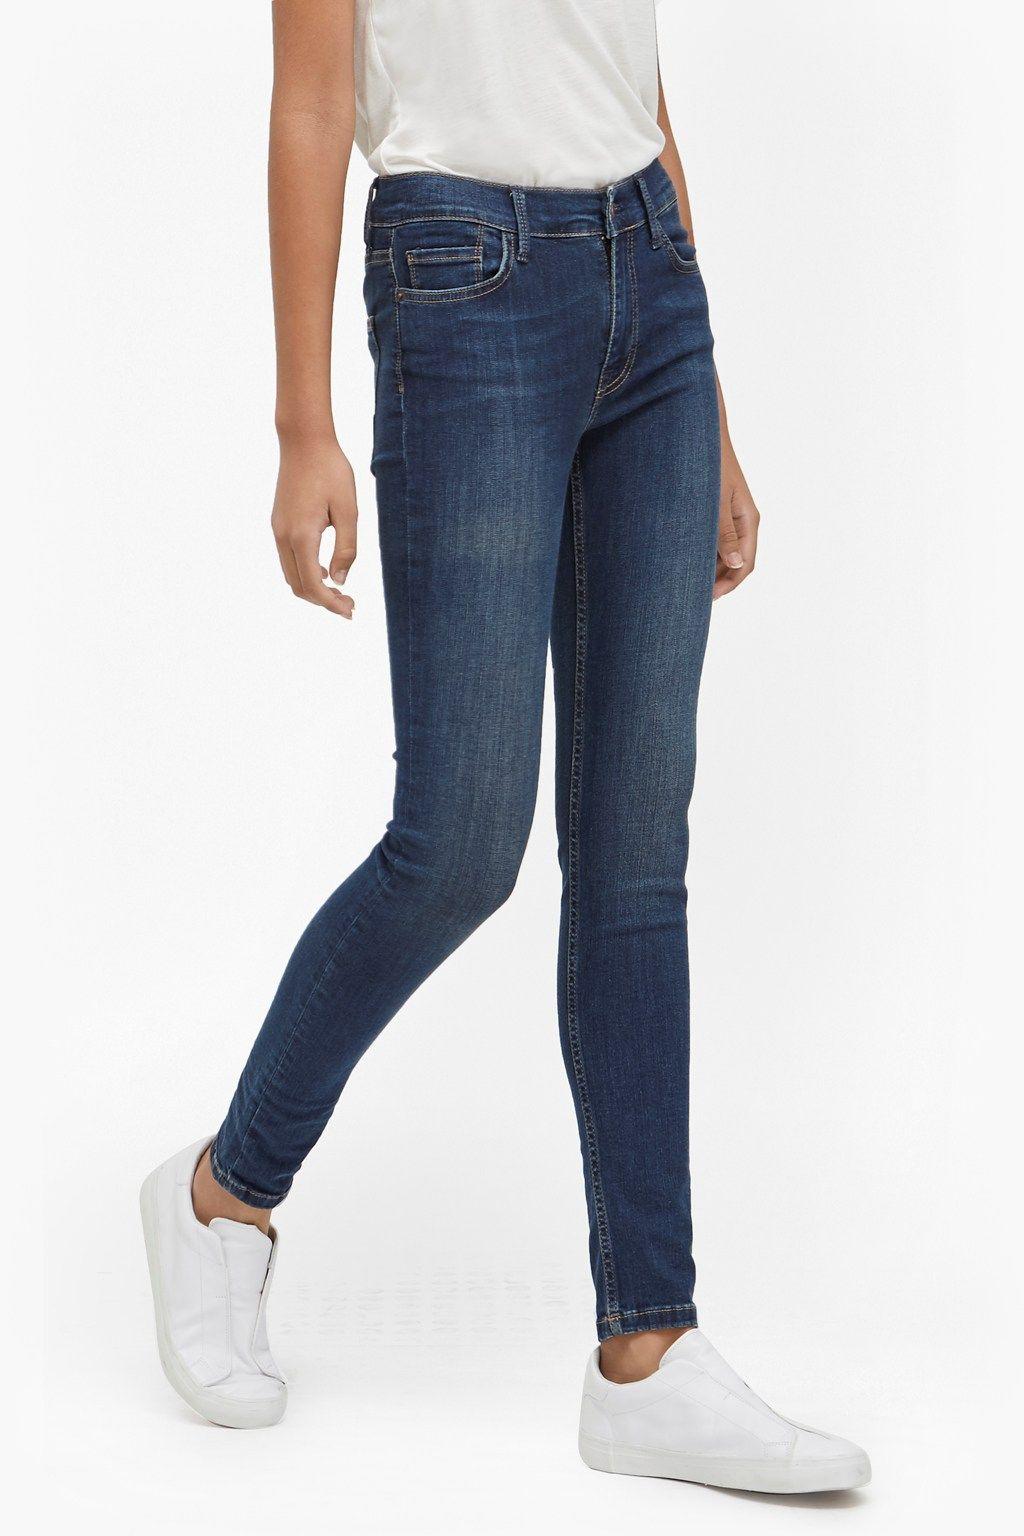 31cd6ecd Rebound Skinny Jeans | FW Finds | Jeans, Skinny Jeans, Jeans for sale